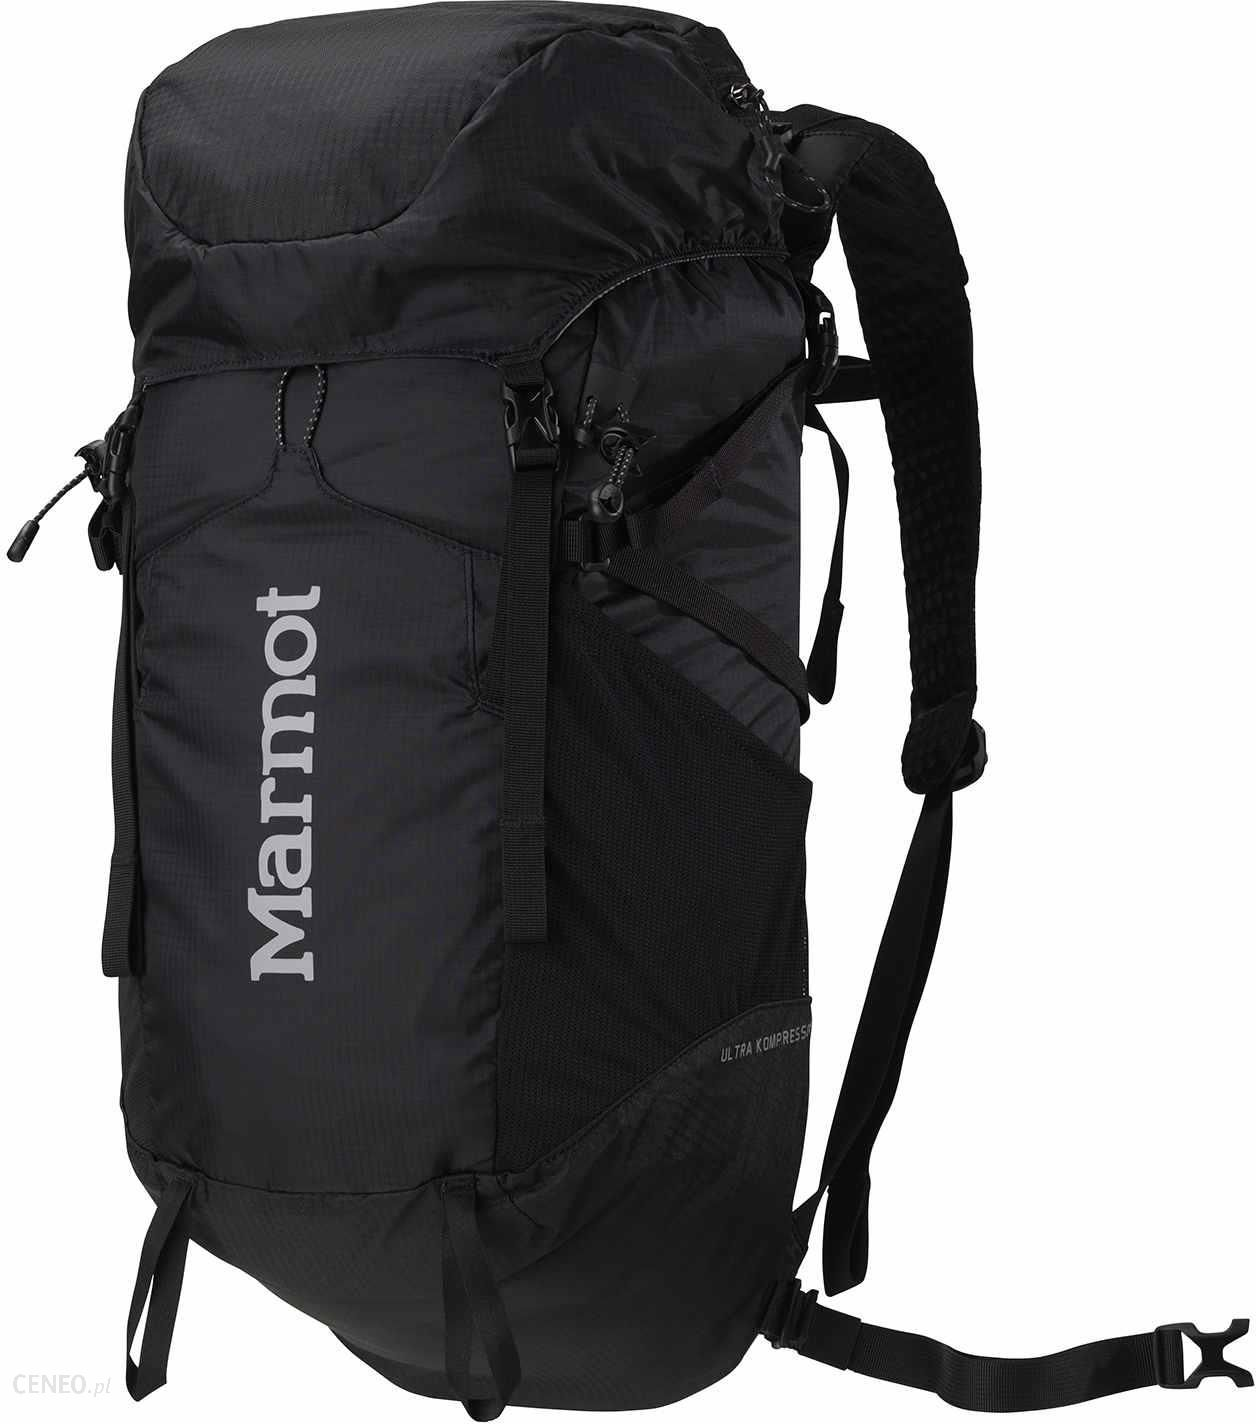 376e39472e69a Plecak Marmot Turystyczny Ultra Kompressor Black - Ceny i opinie ...